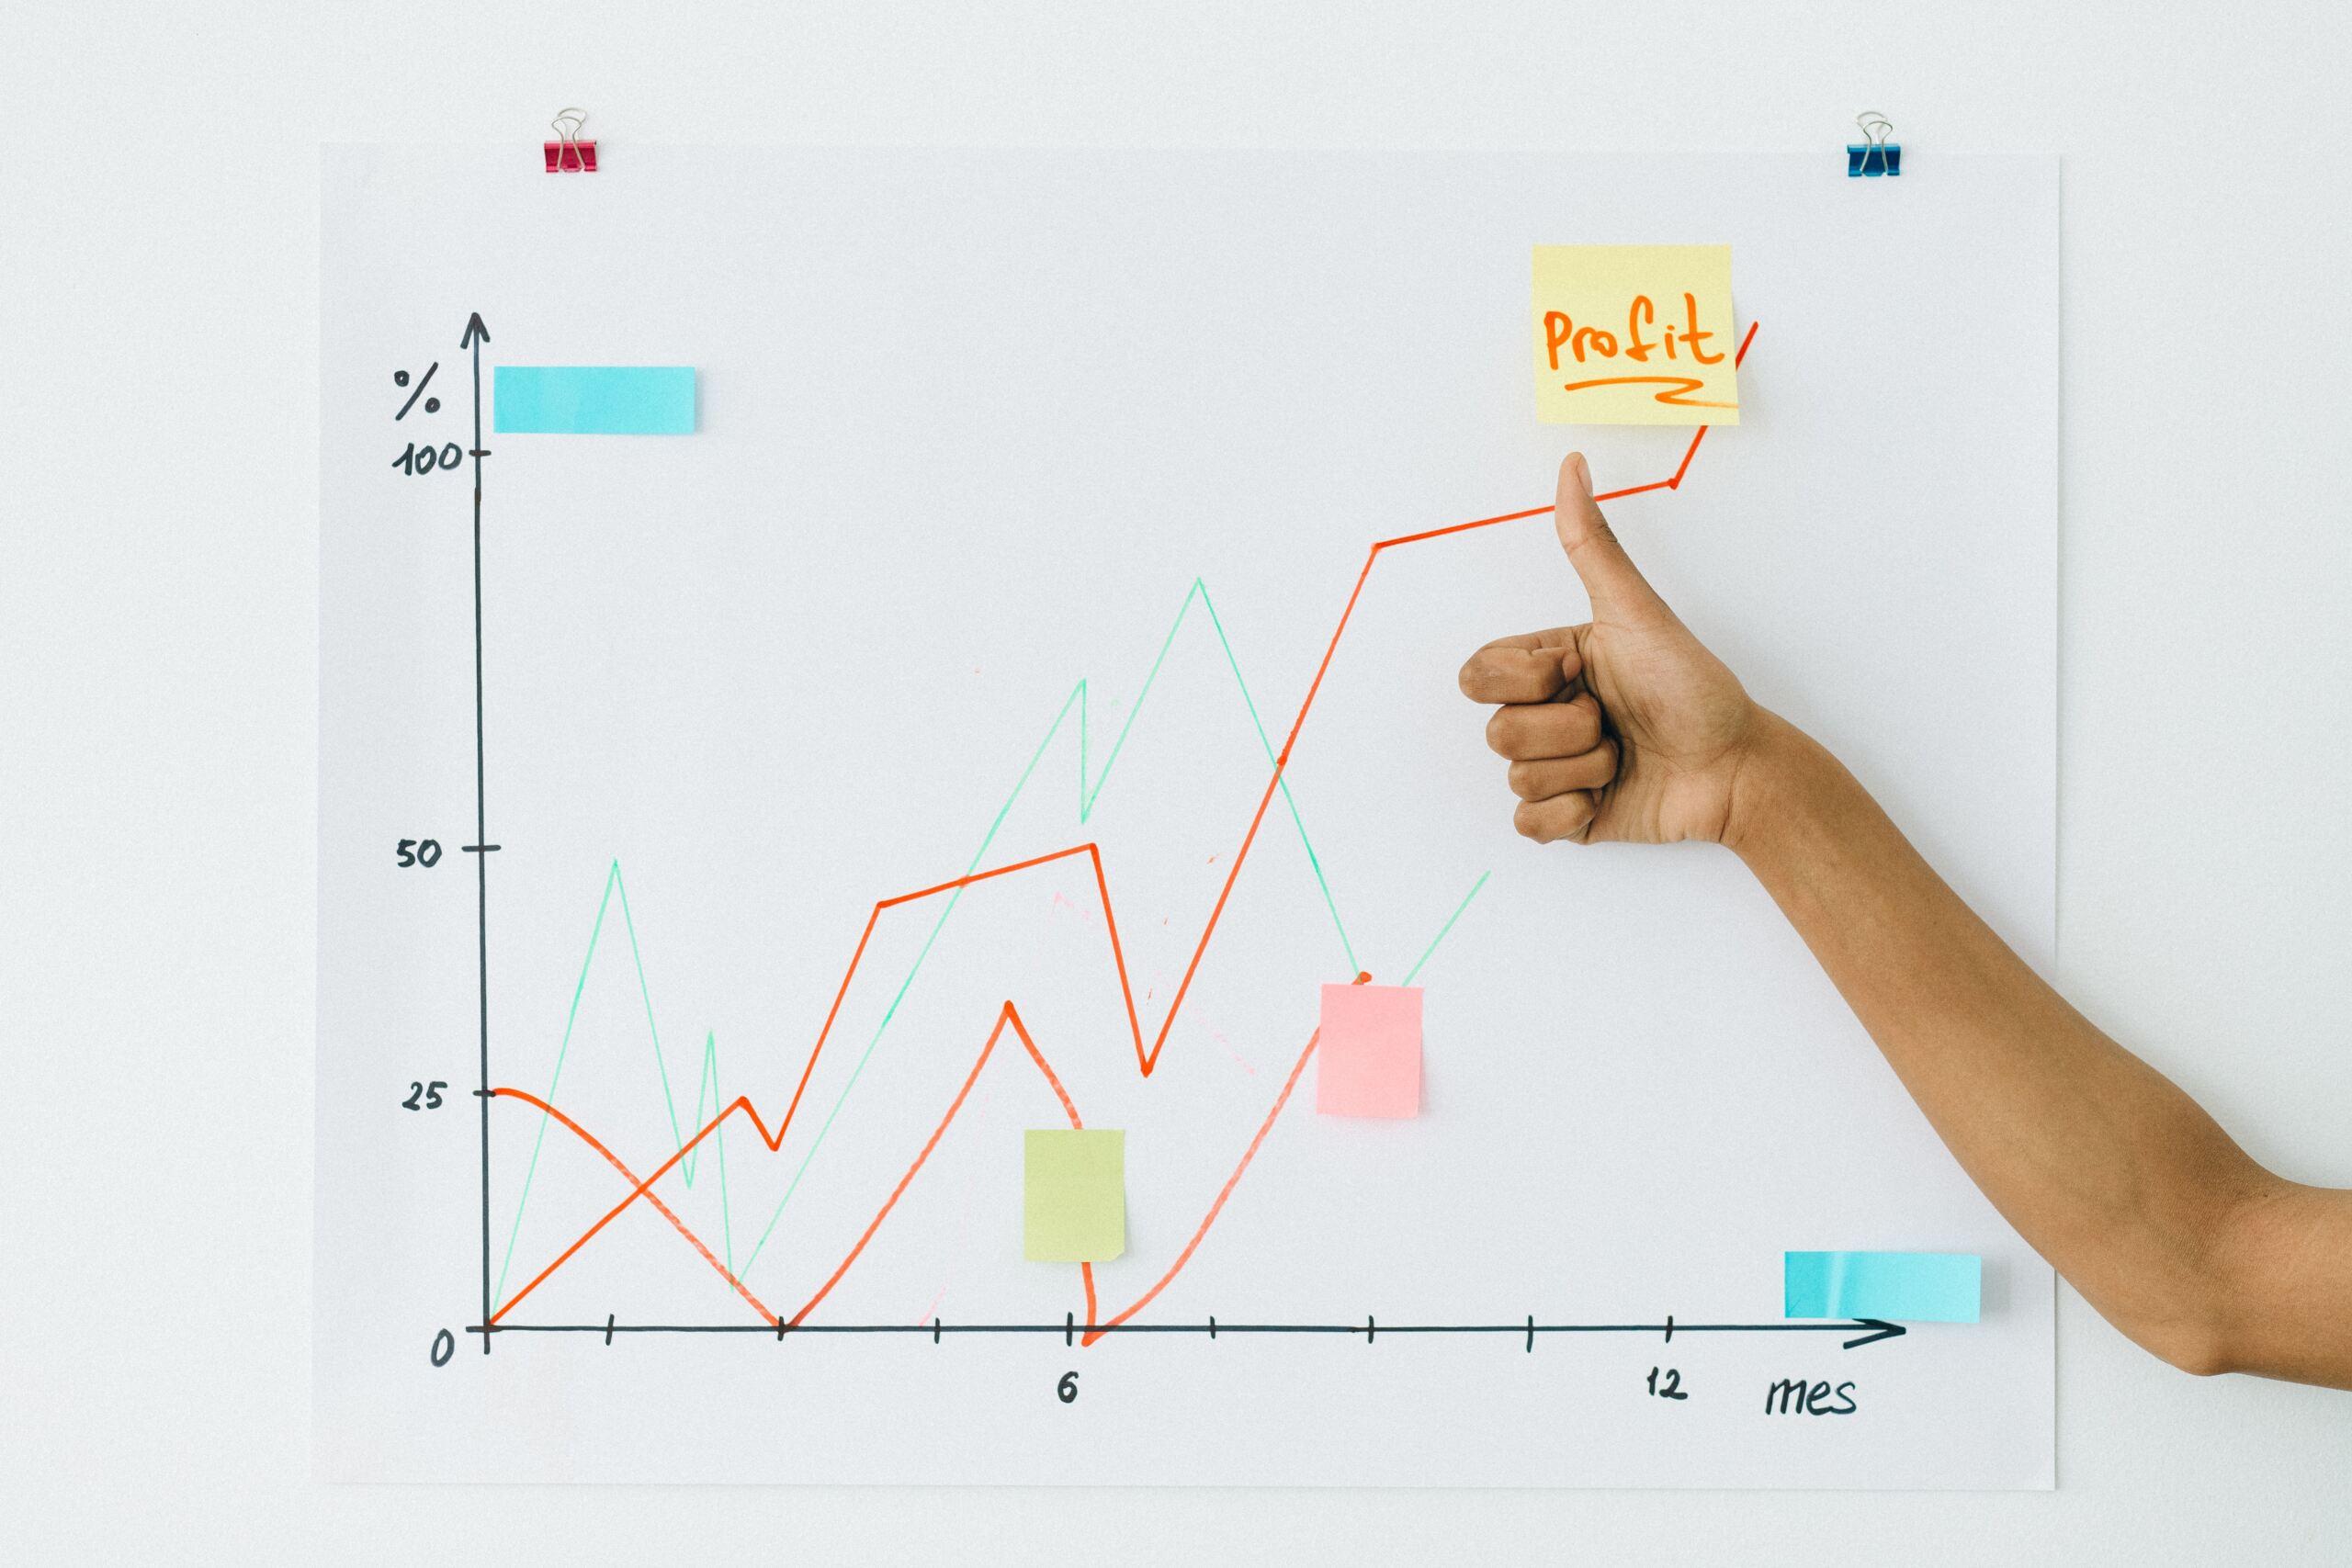 Augmented Analytics Success